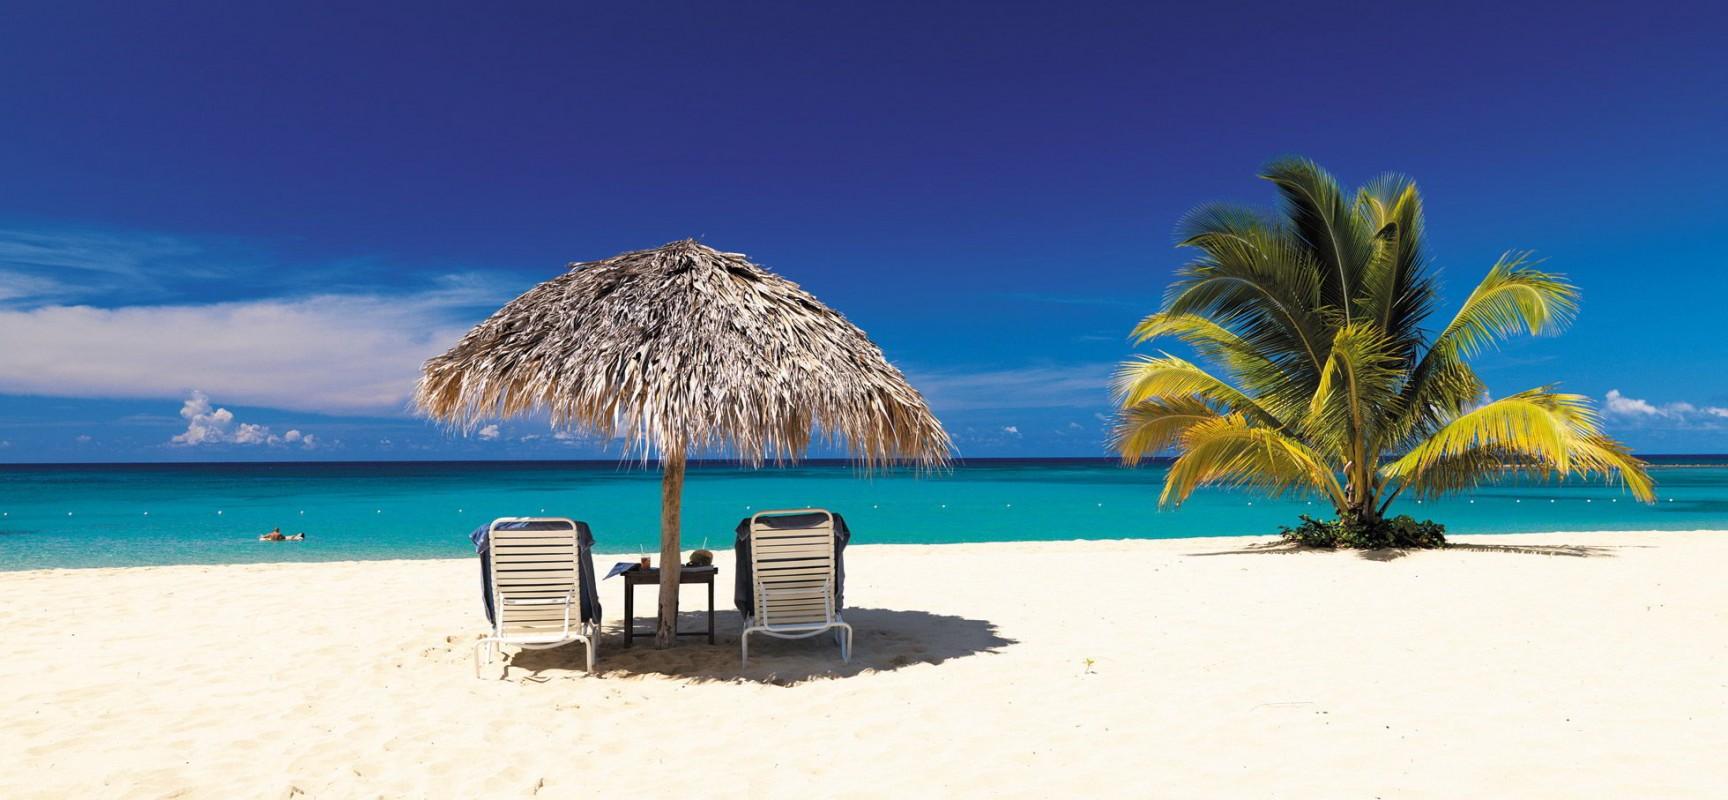 Beach in jamaica pictures